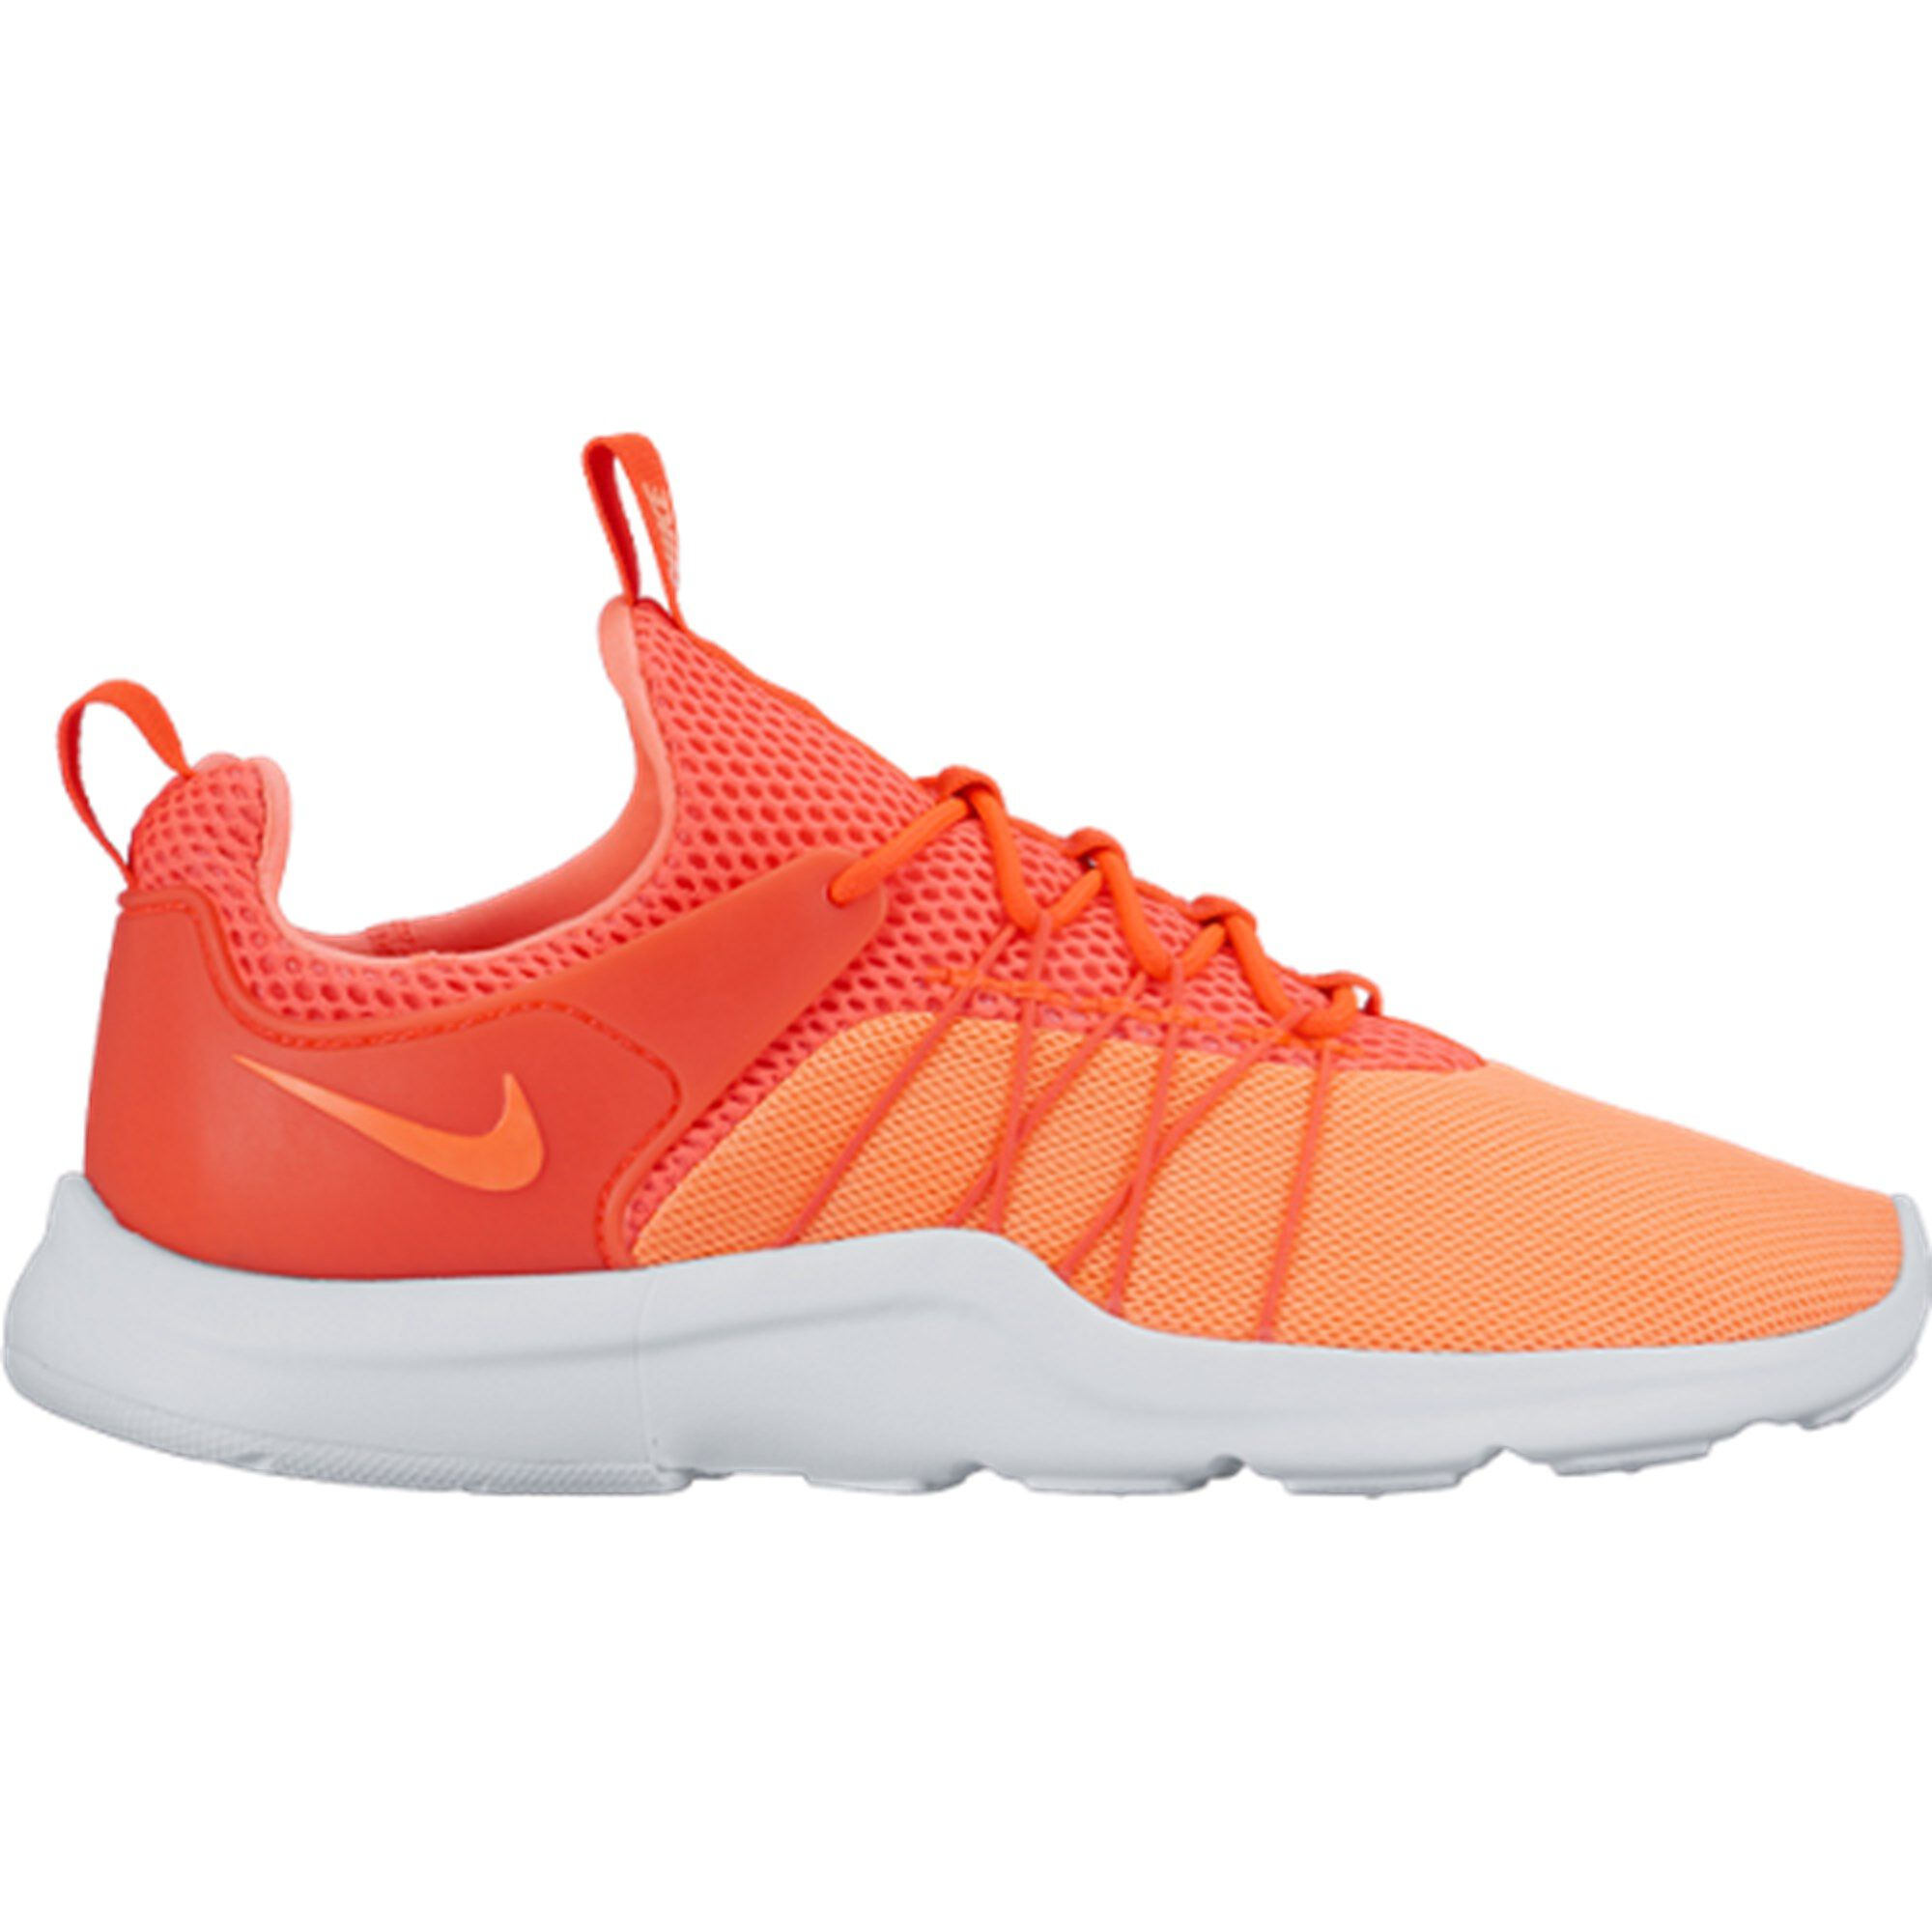 the latest 6aedb 80311 usa kvinde sko nike wmns darwin sneakers sortnike roshe run billignike  f5911 c7456  new style orange nike darwin kvinder intersport.dk d2d4b e36ca